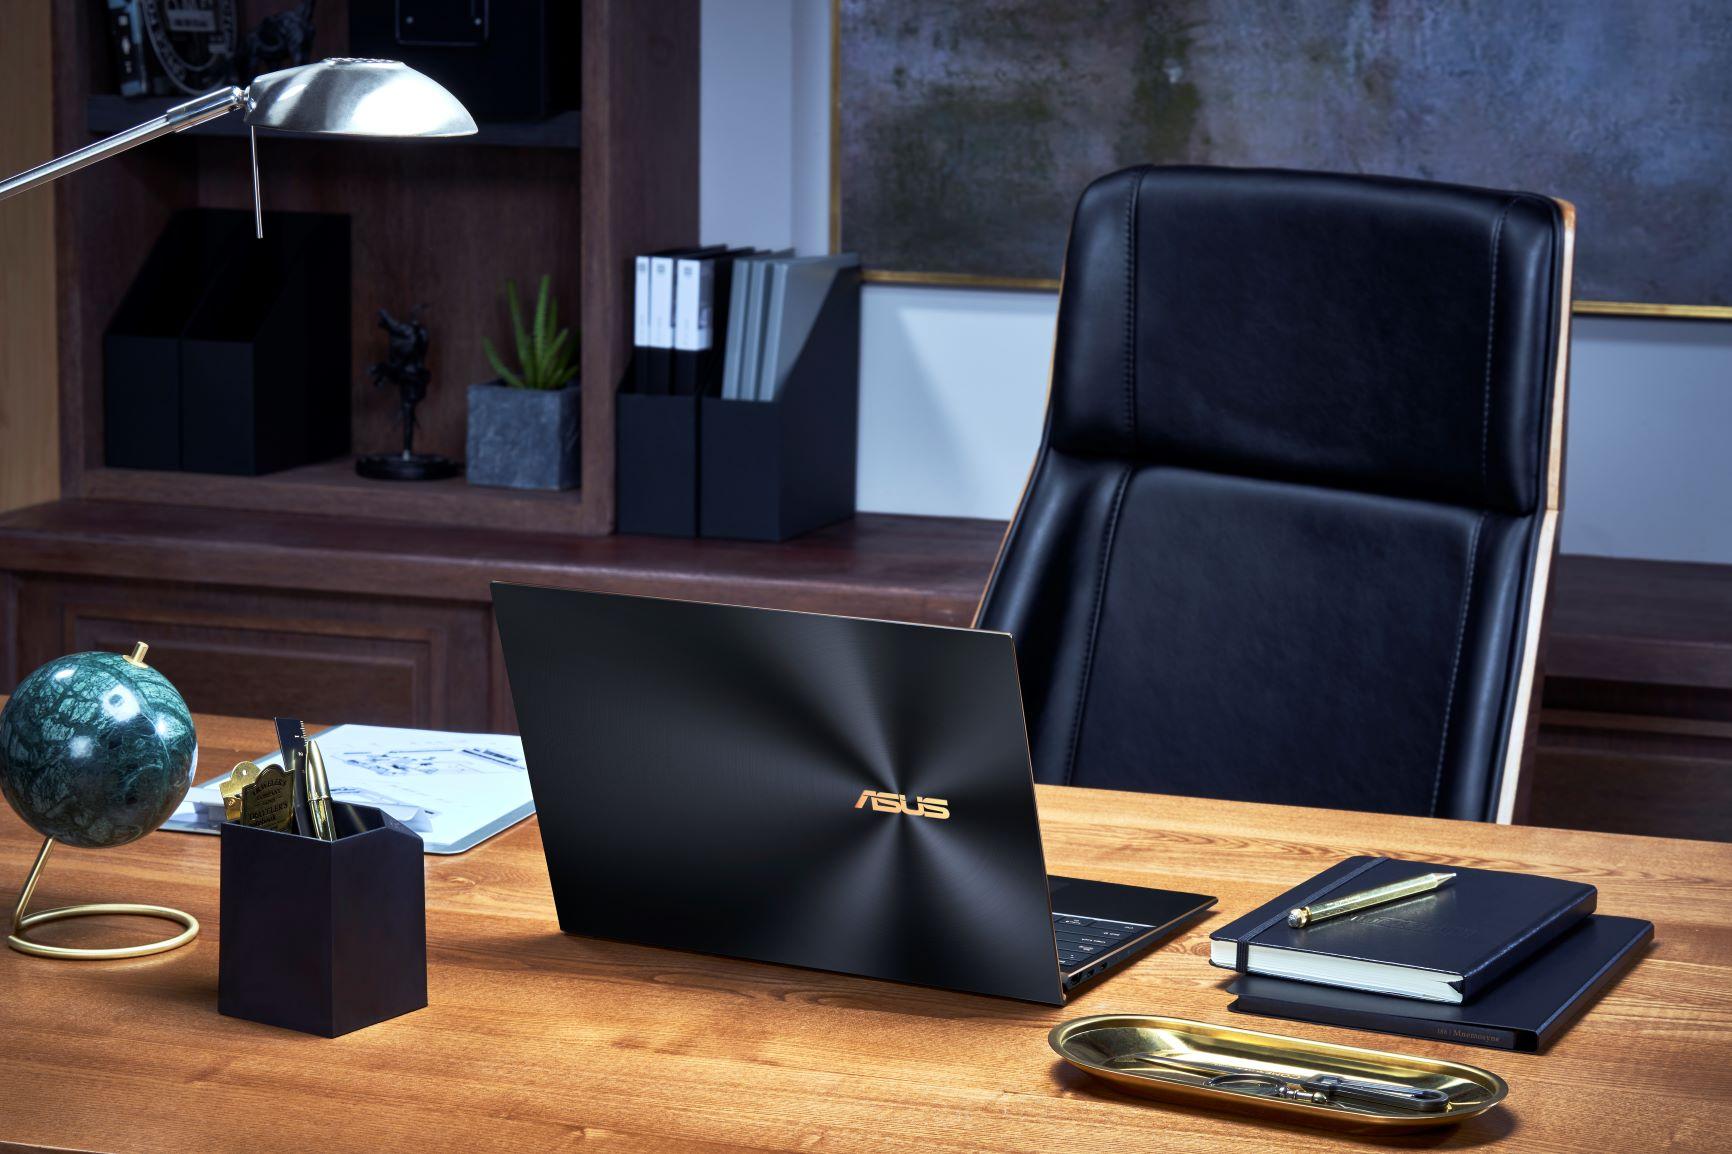 ASUS_ZenBook S UX393_Scenario photo_Jade black and dimond cut